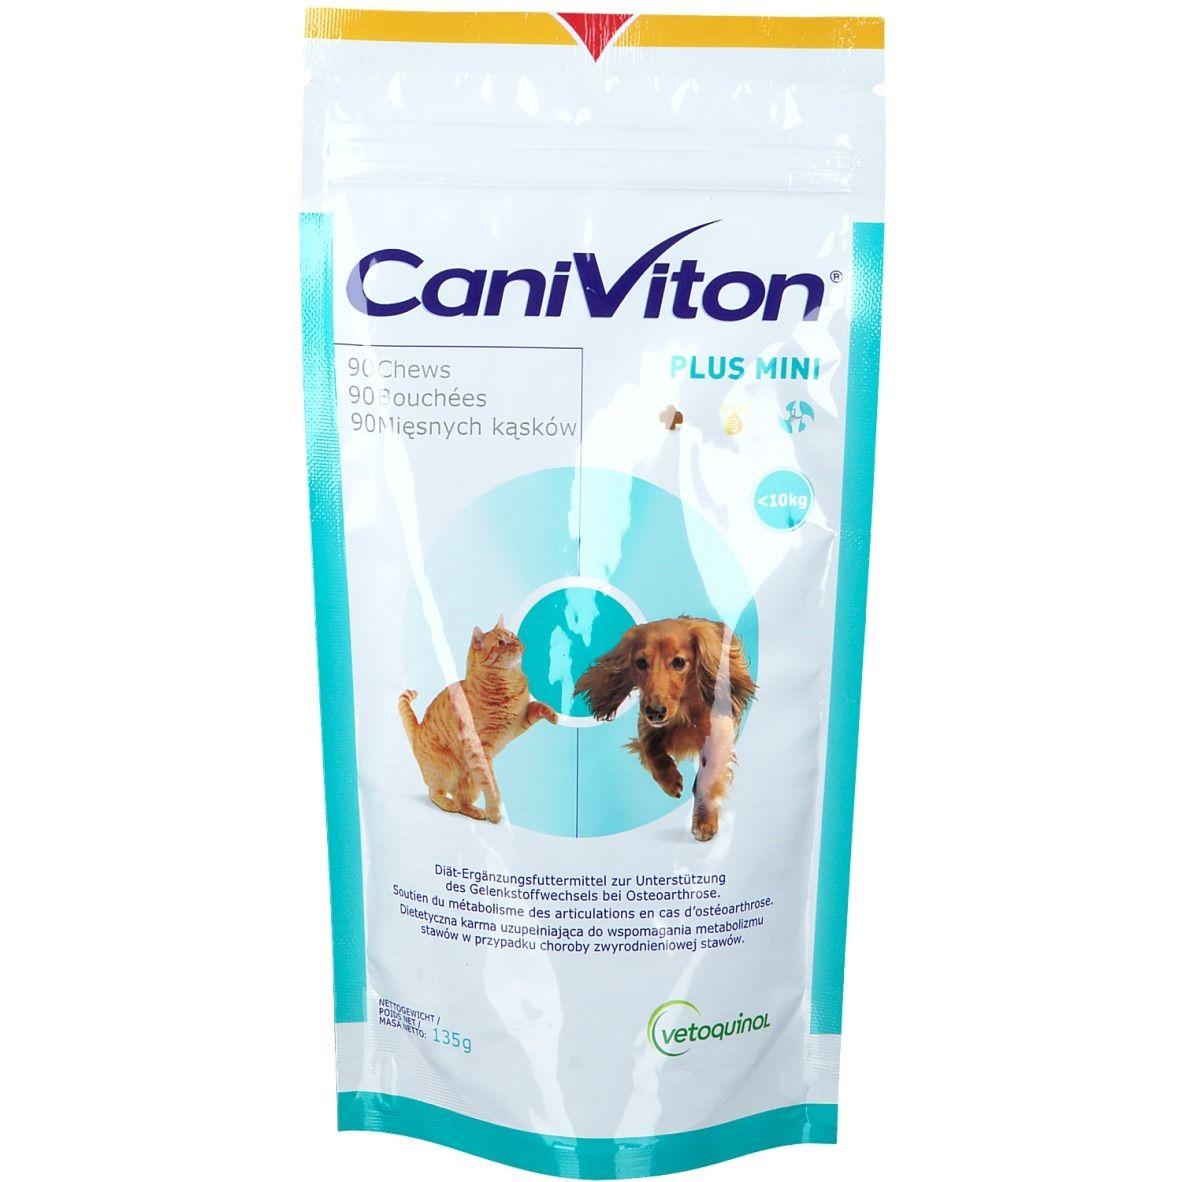 CaniViton® Plus Mini